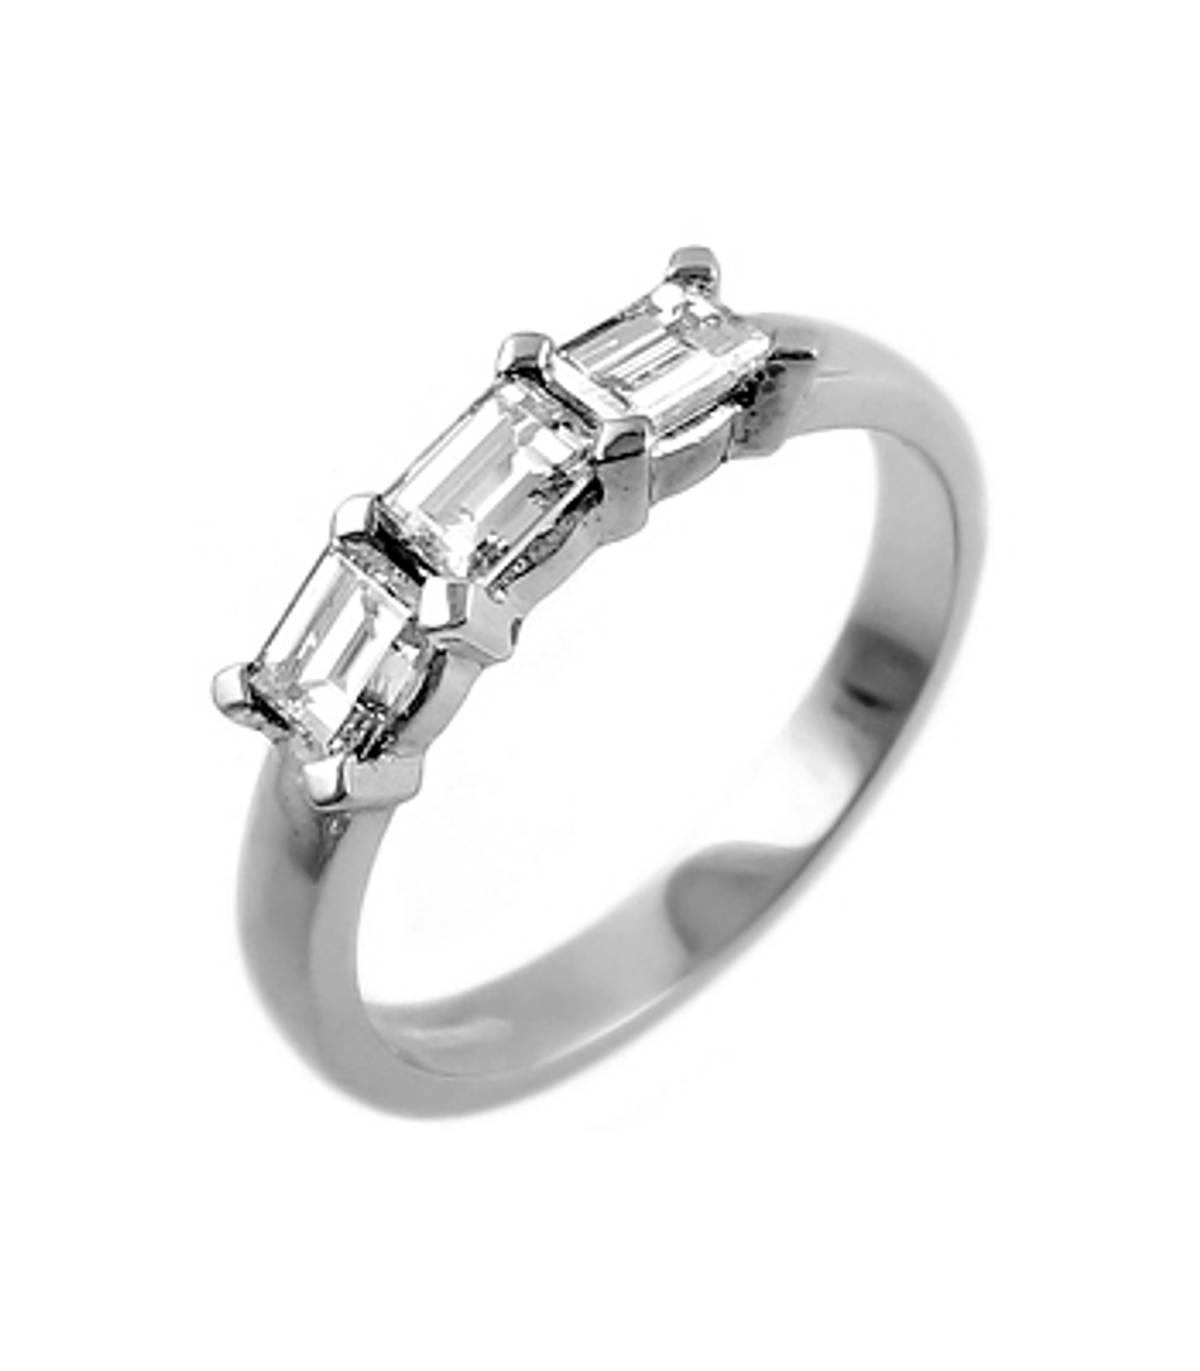 3 STONE DIAMOND RING 18k white gold 3st emerald cut diamond ringDETAILSCarat: total diamond weight 0.72ctsCut: Emerald cutMetal: 18k white gold